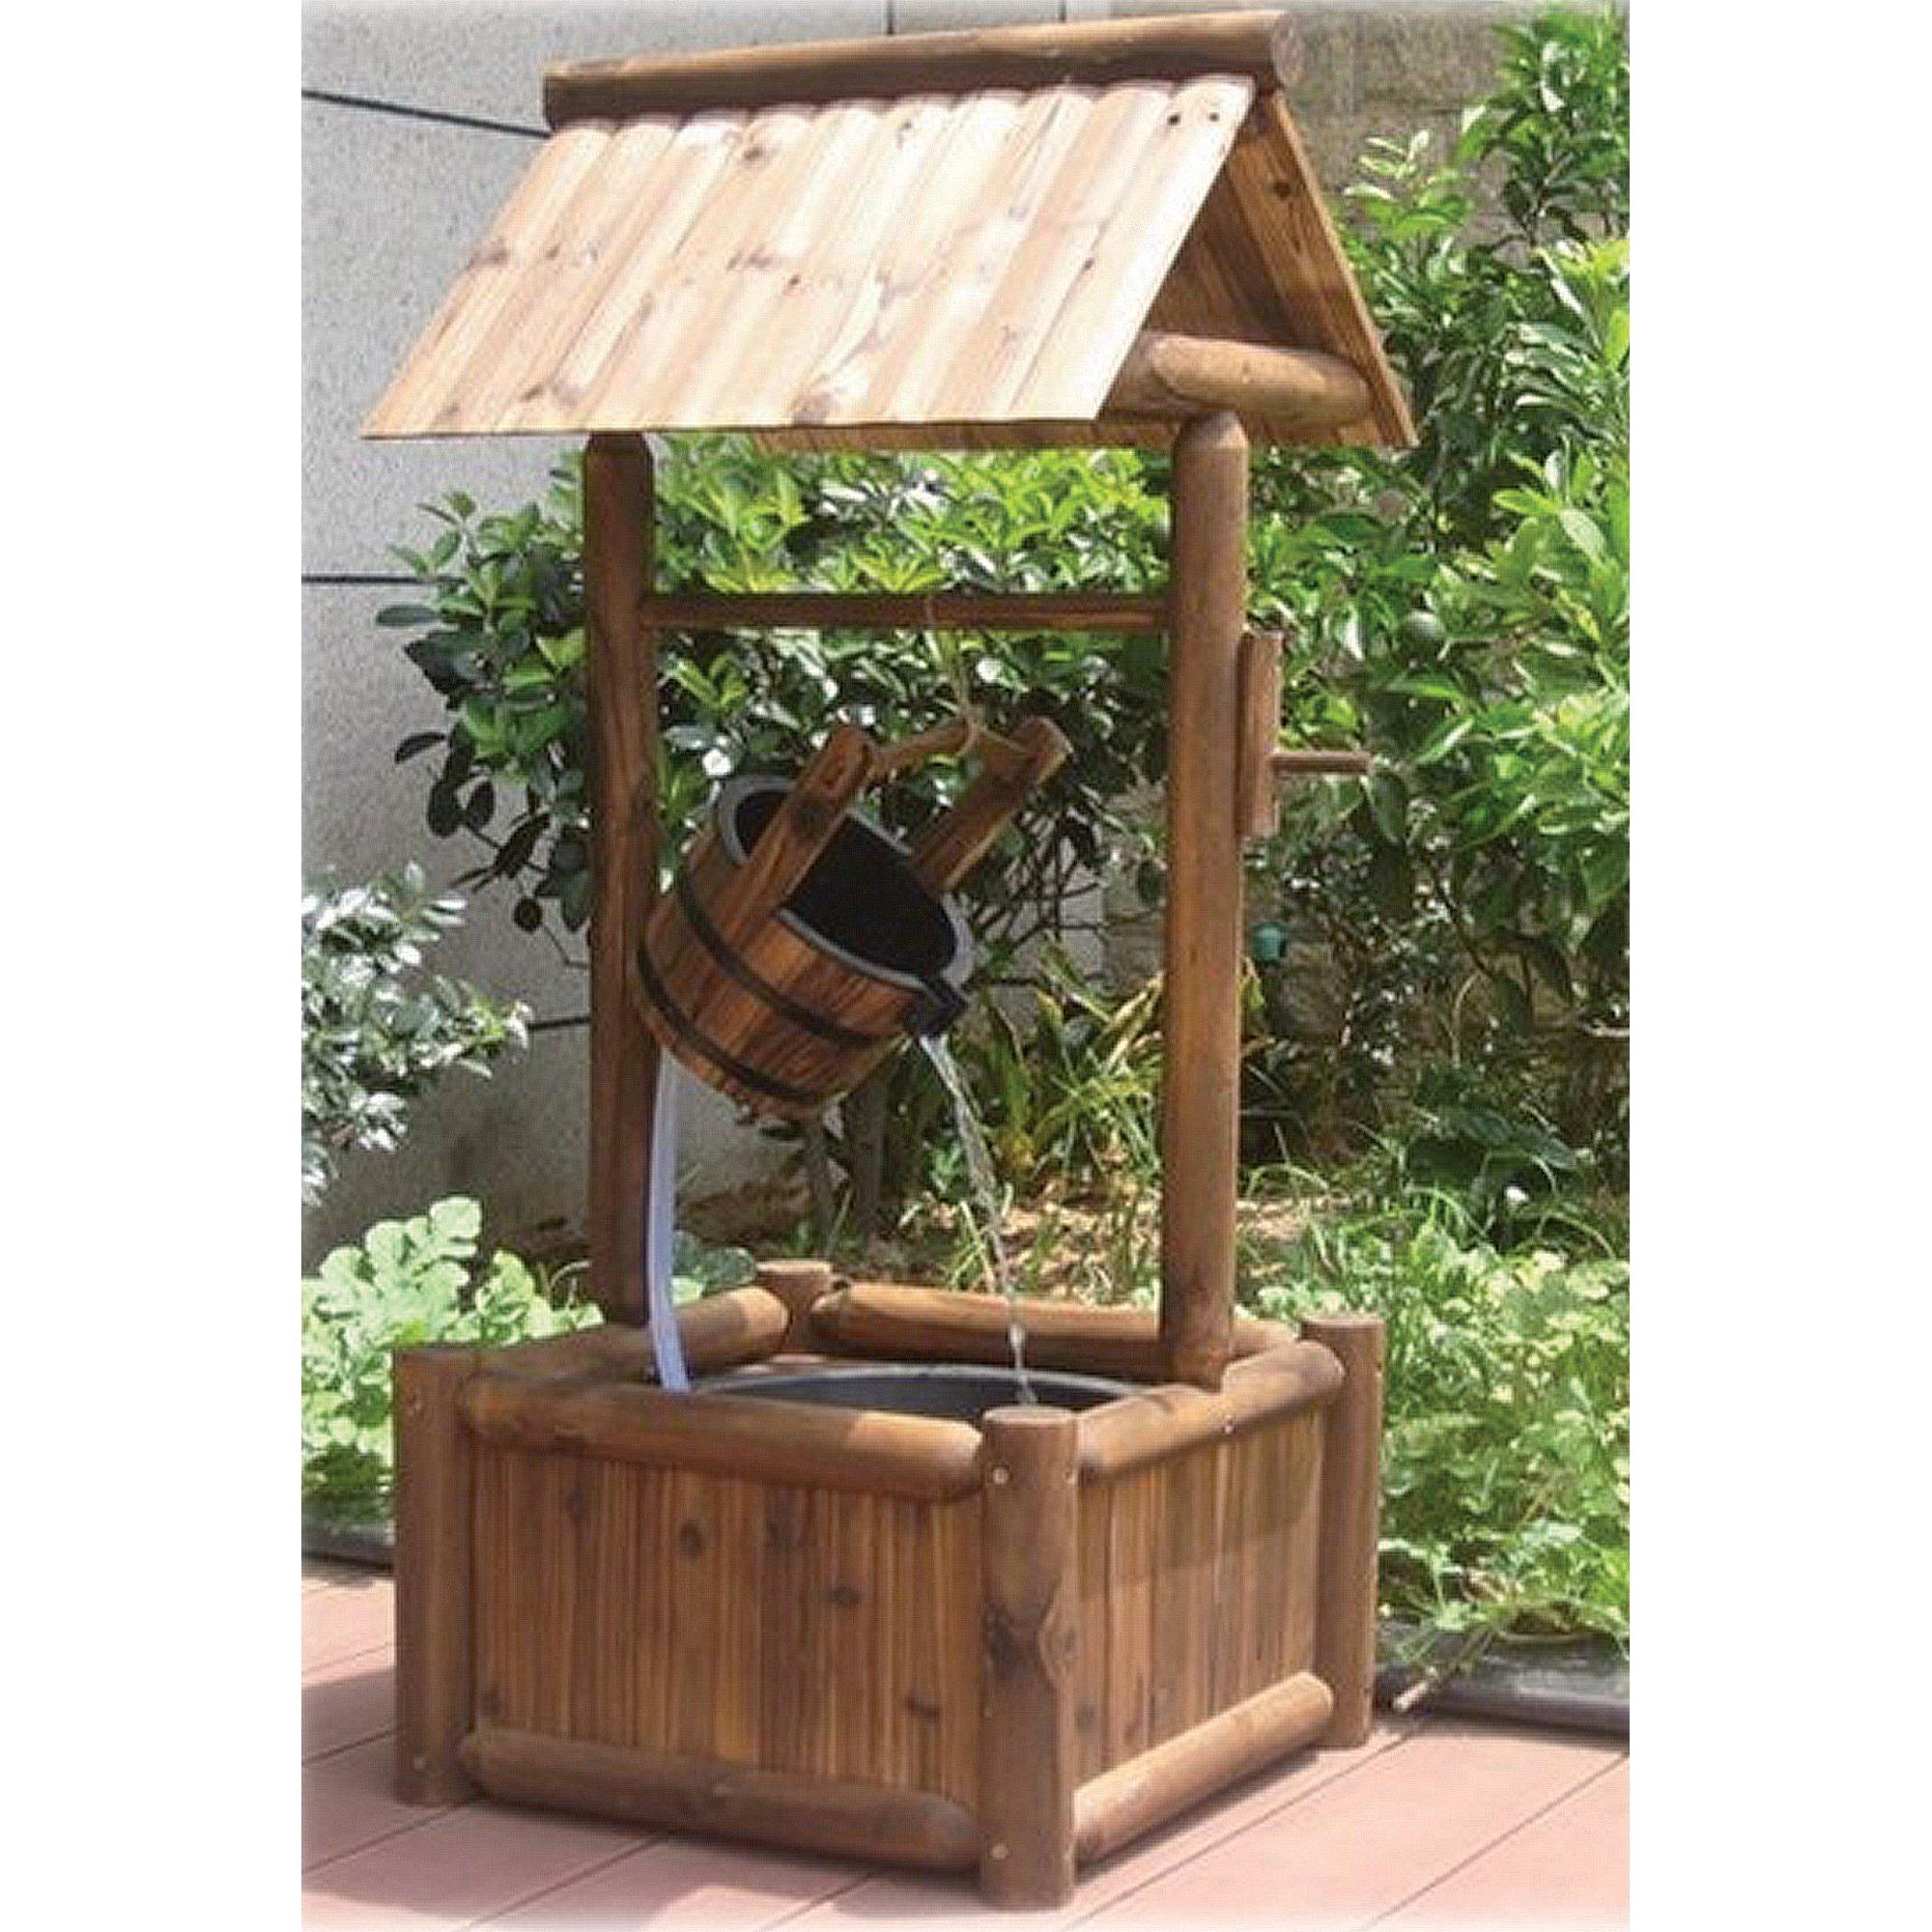 Wooden Garden Wishing Well Fountain